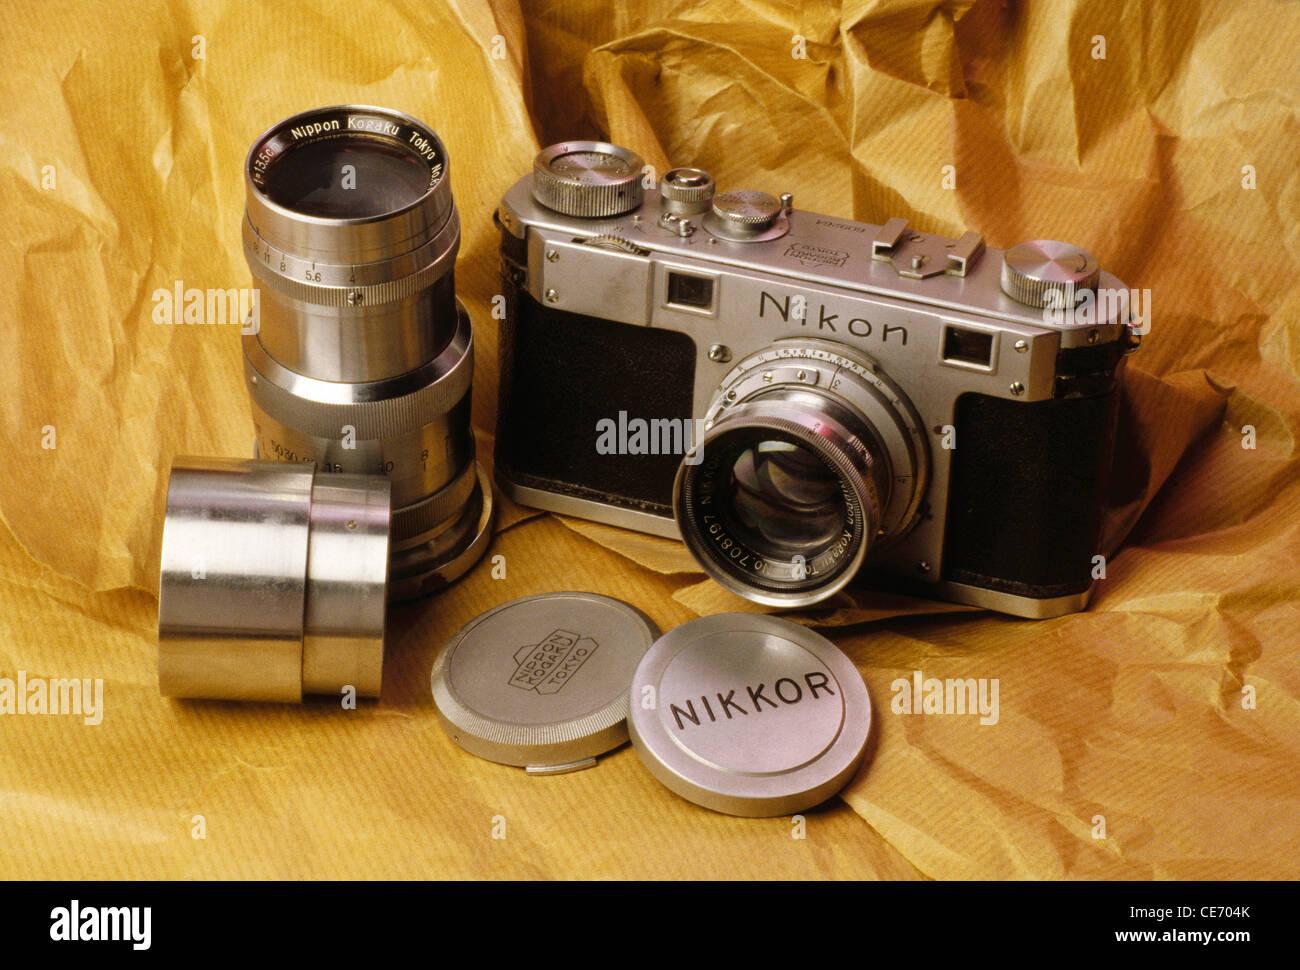 AAD 83949 : old antique 35 mm Nikon rangefinder camera Nikkor wide angle telephoto lens cap - Stock Image